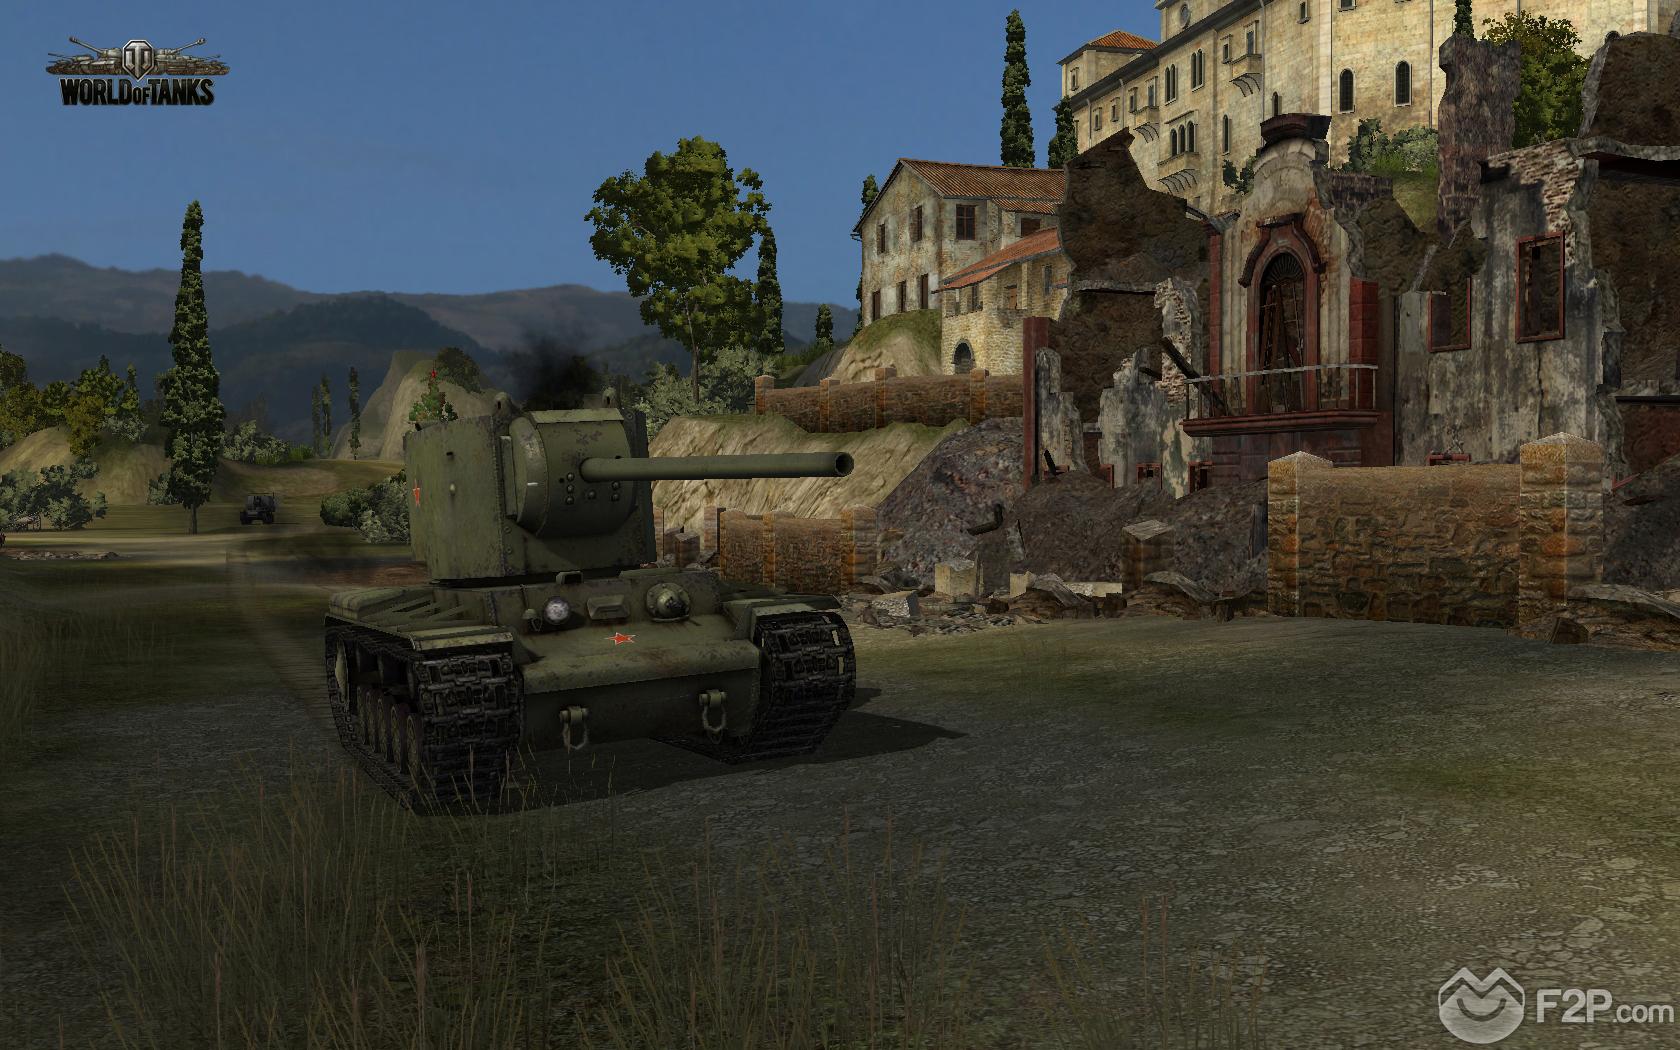 Click image for larger version.Name:World of Tanks 80.jpgViews:266Size:1.35 MBID:3995